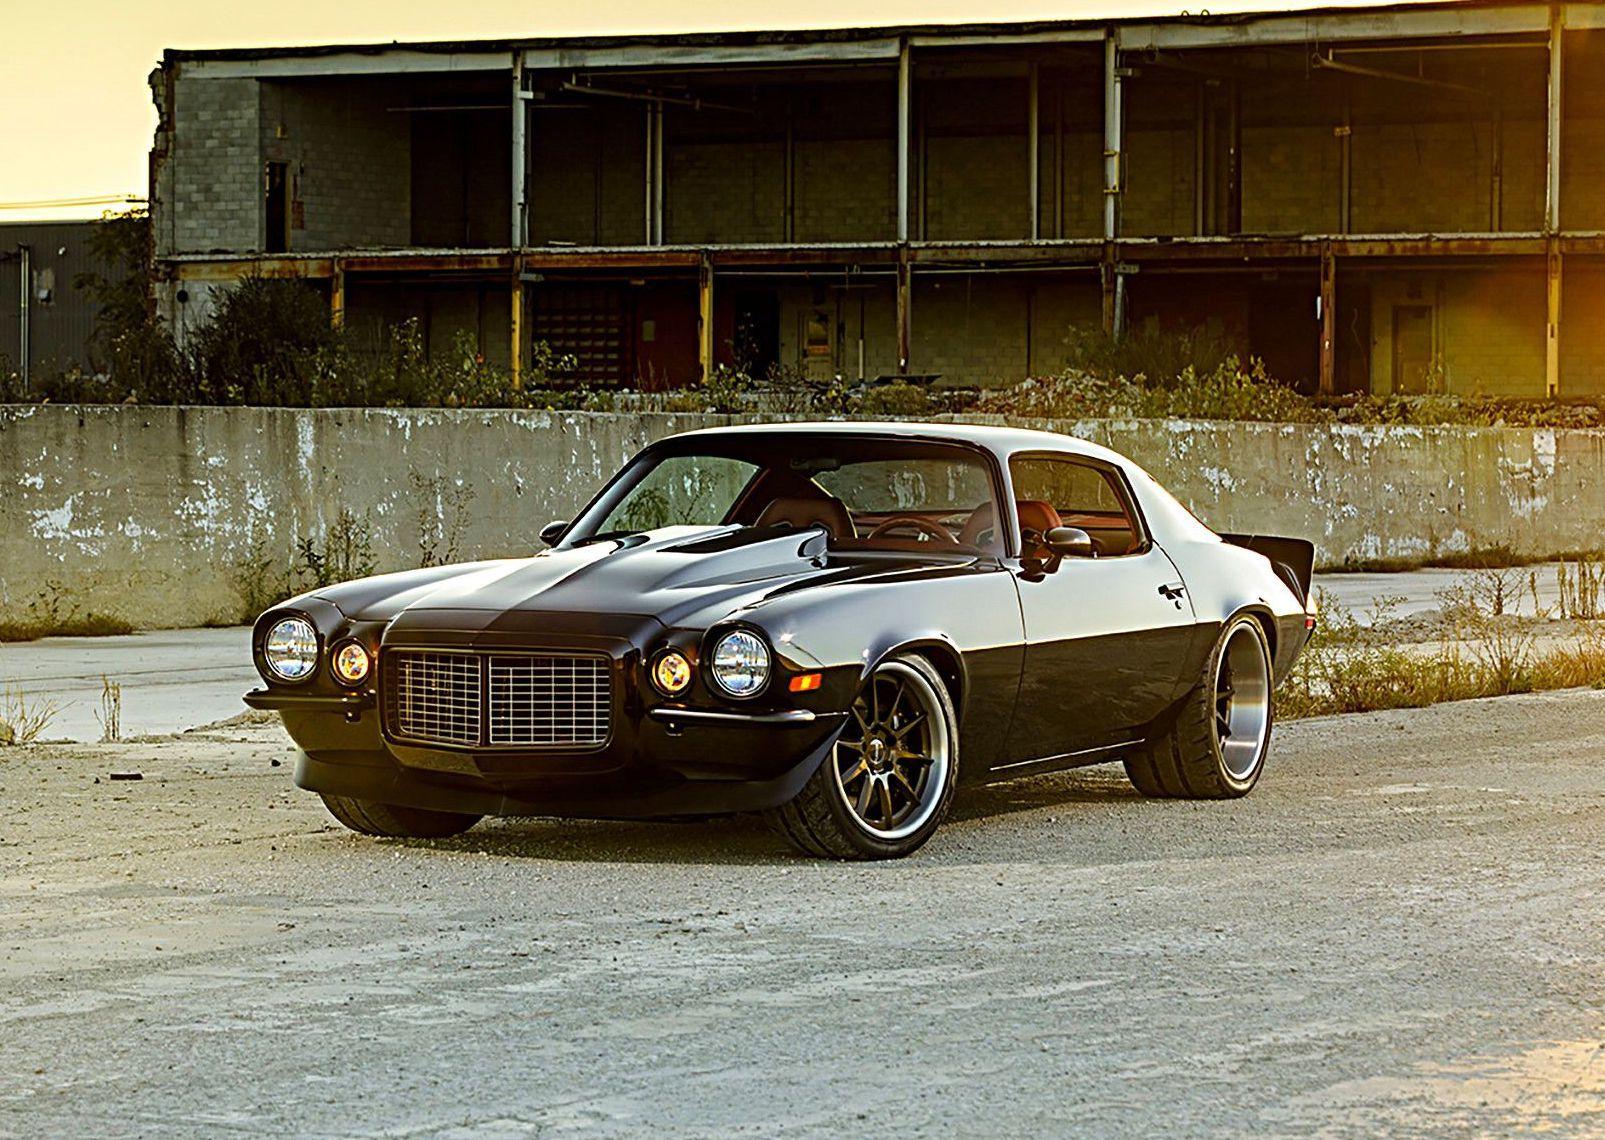 1970 Chevrolet Camaro | Don Hauser's Pro-Touring 1970 Camaro on Forgeline RB3C Wheels